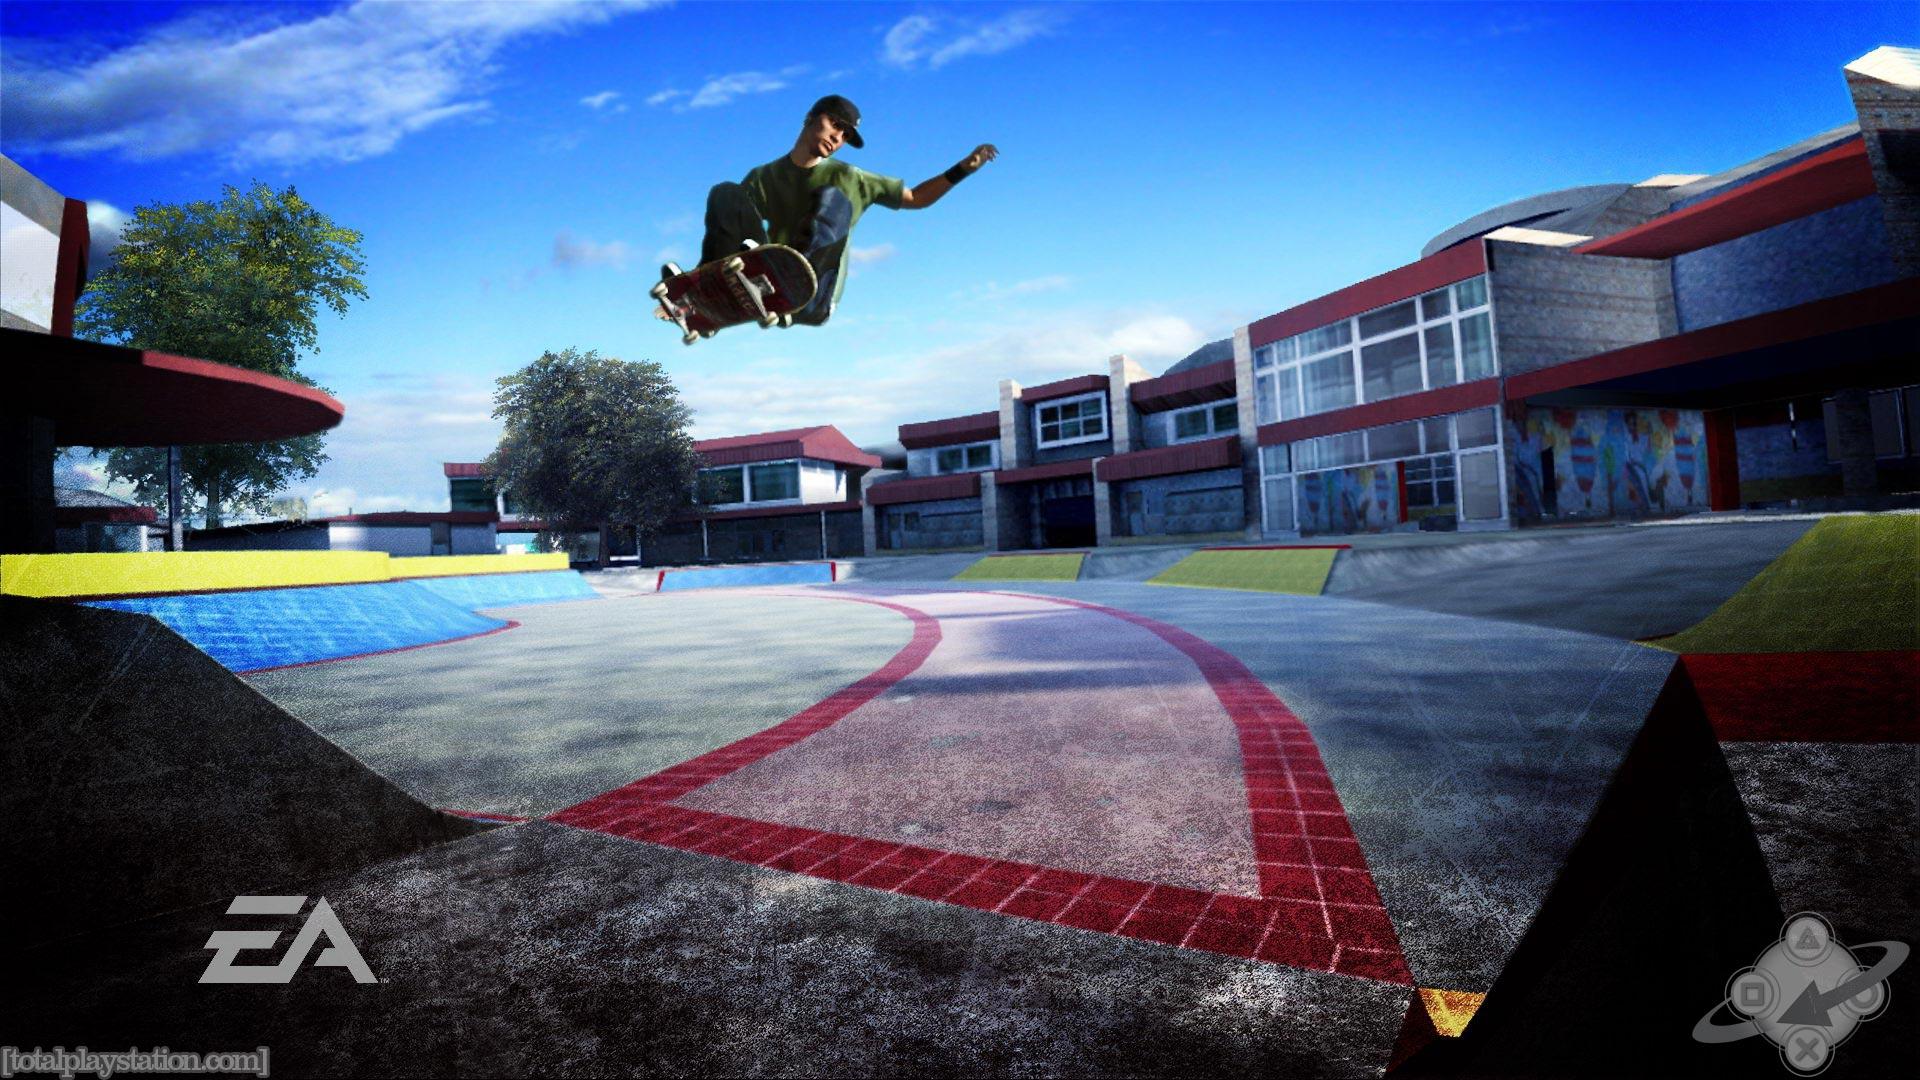 Ea Skate wallpaper 29809